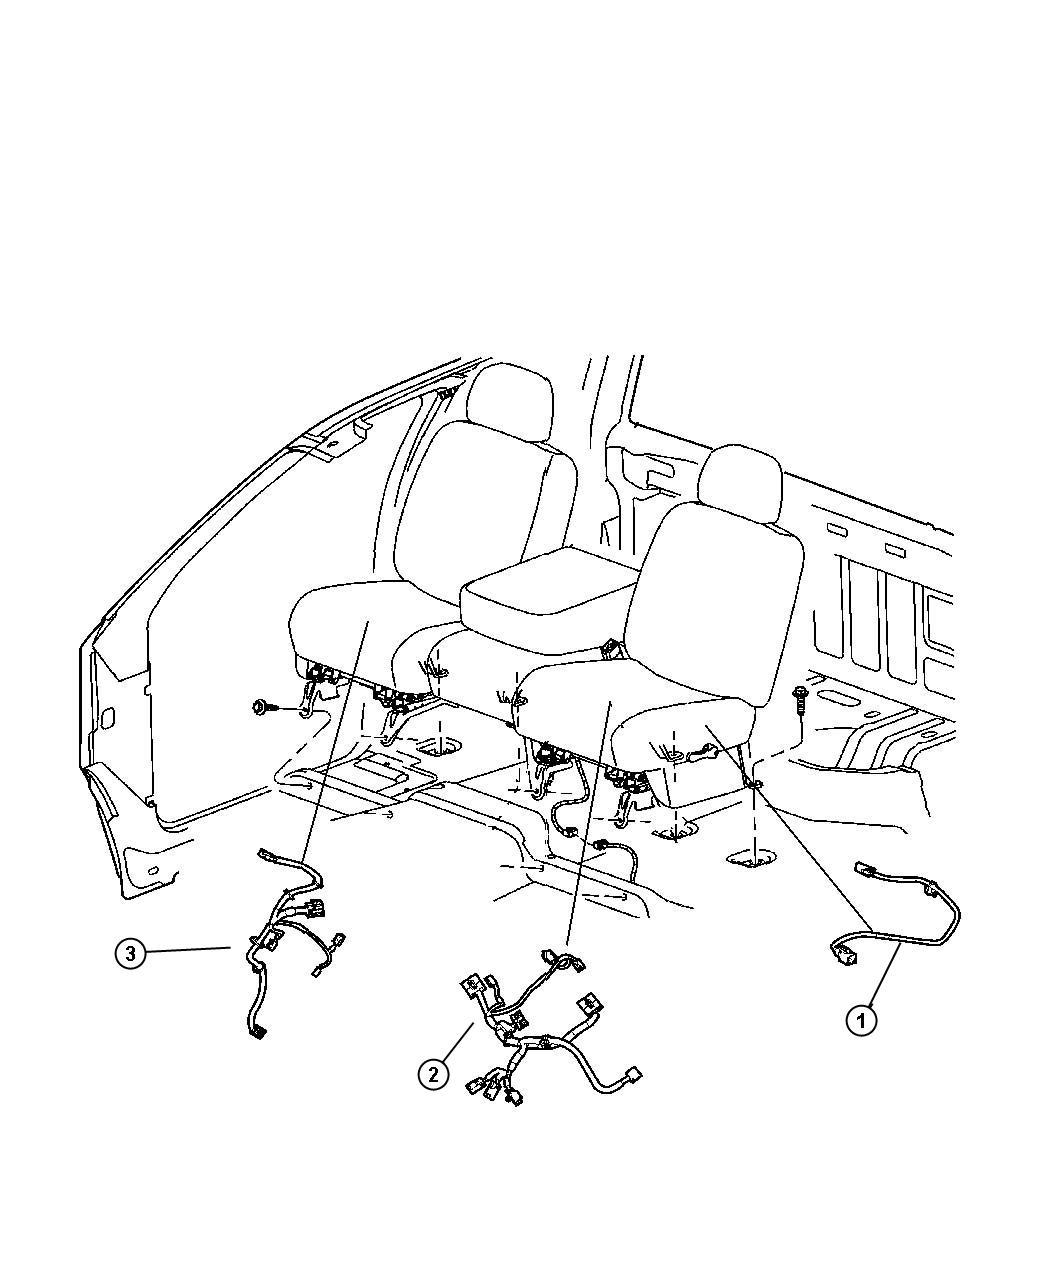 Ram Laramie Wiring Power Seat Power 6 Way Driver Seat